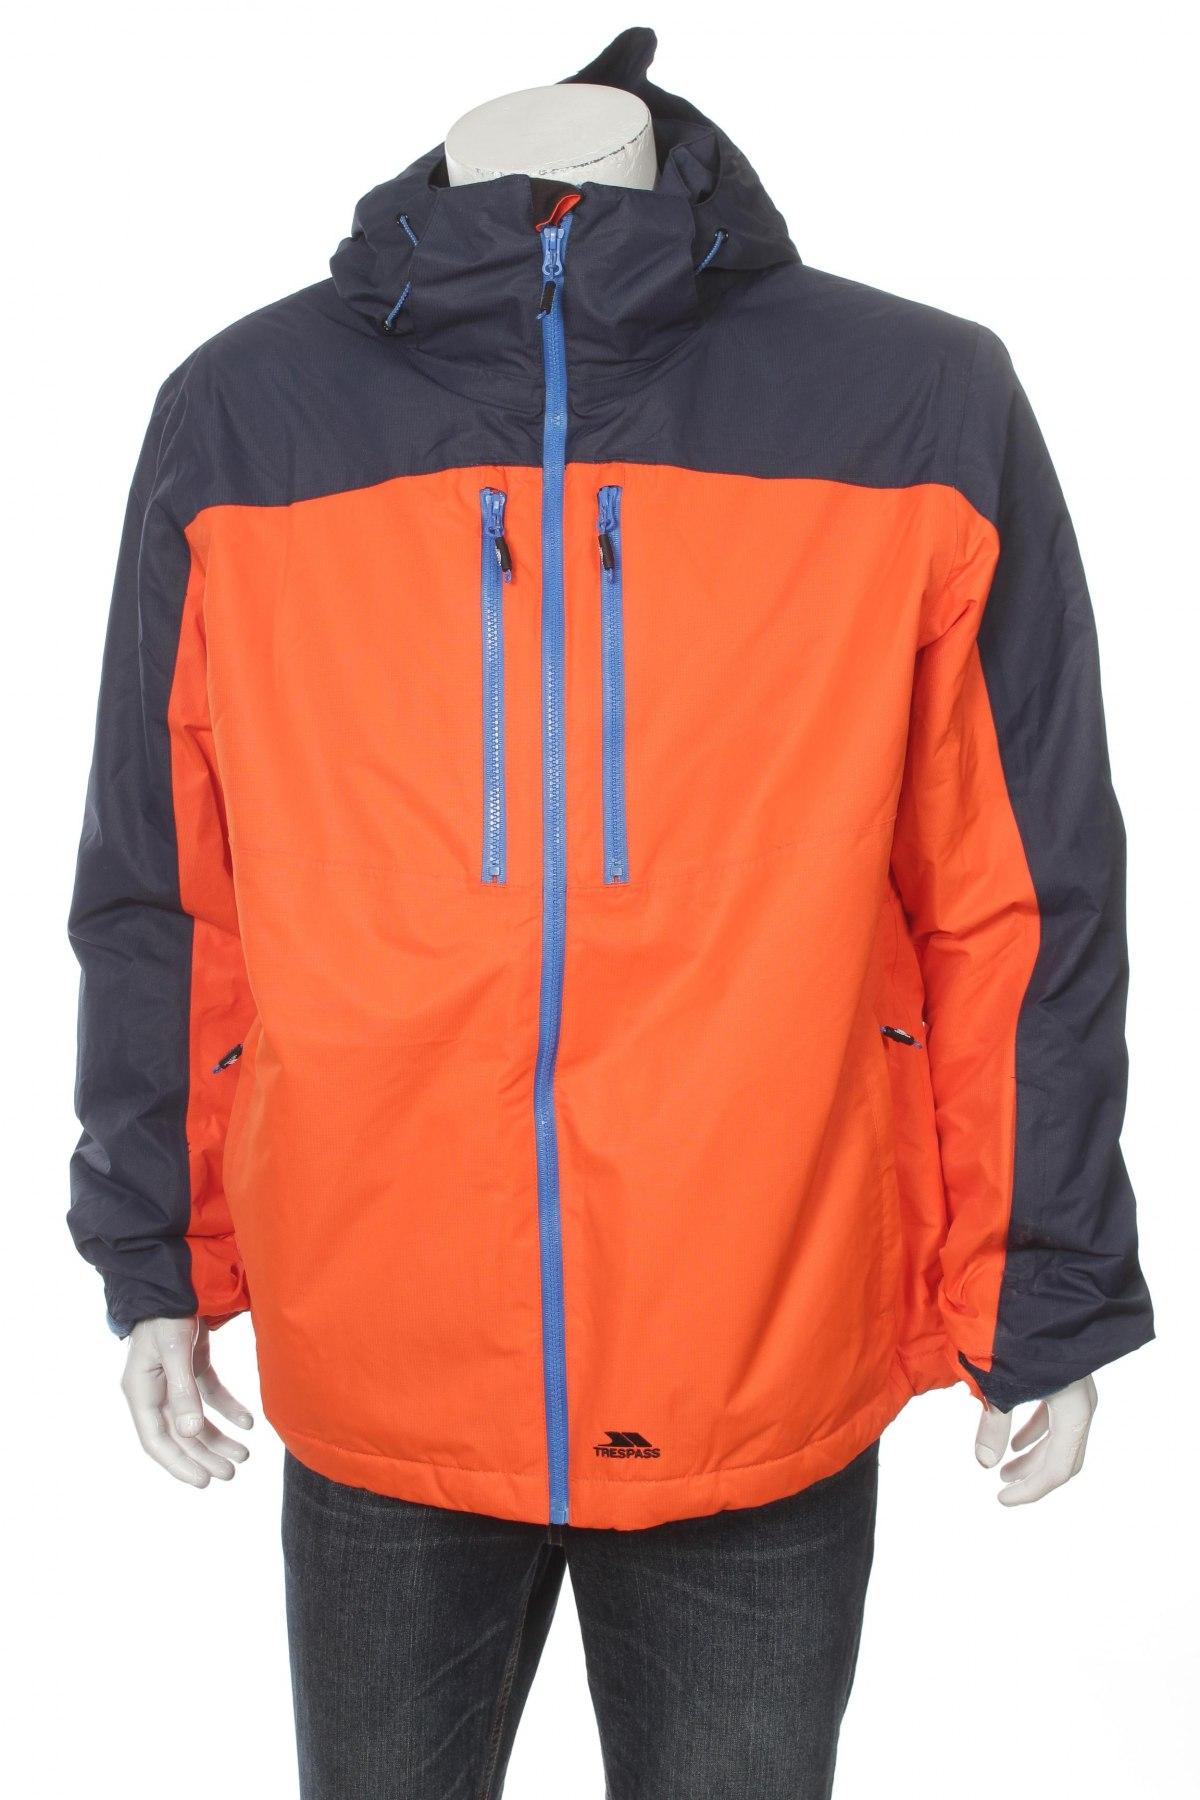 f1029ec4214 Ανδρικό μπουφάν για χειμερινά σπορ Trespass - σε συμφέρουσα τιμή στο ...